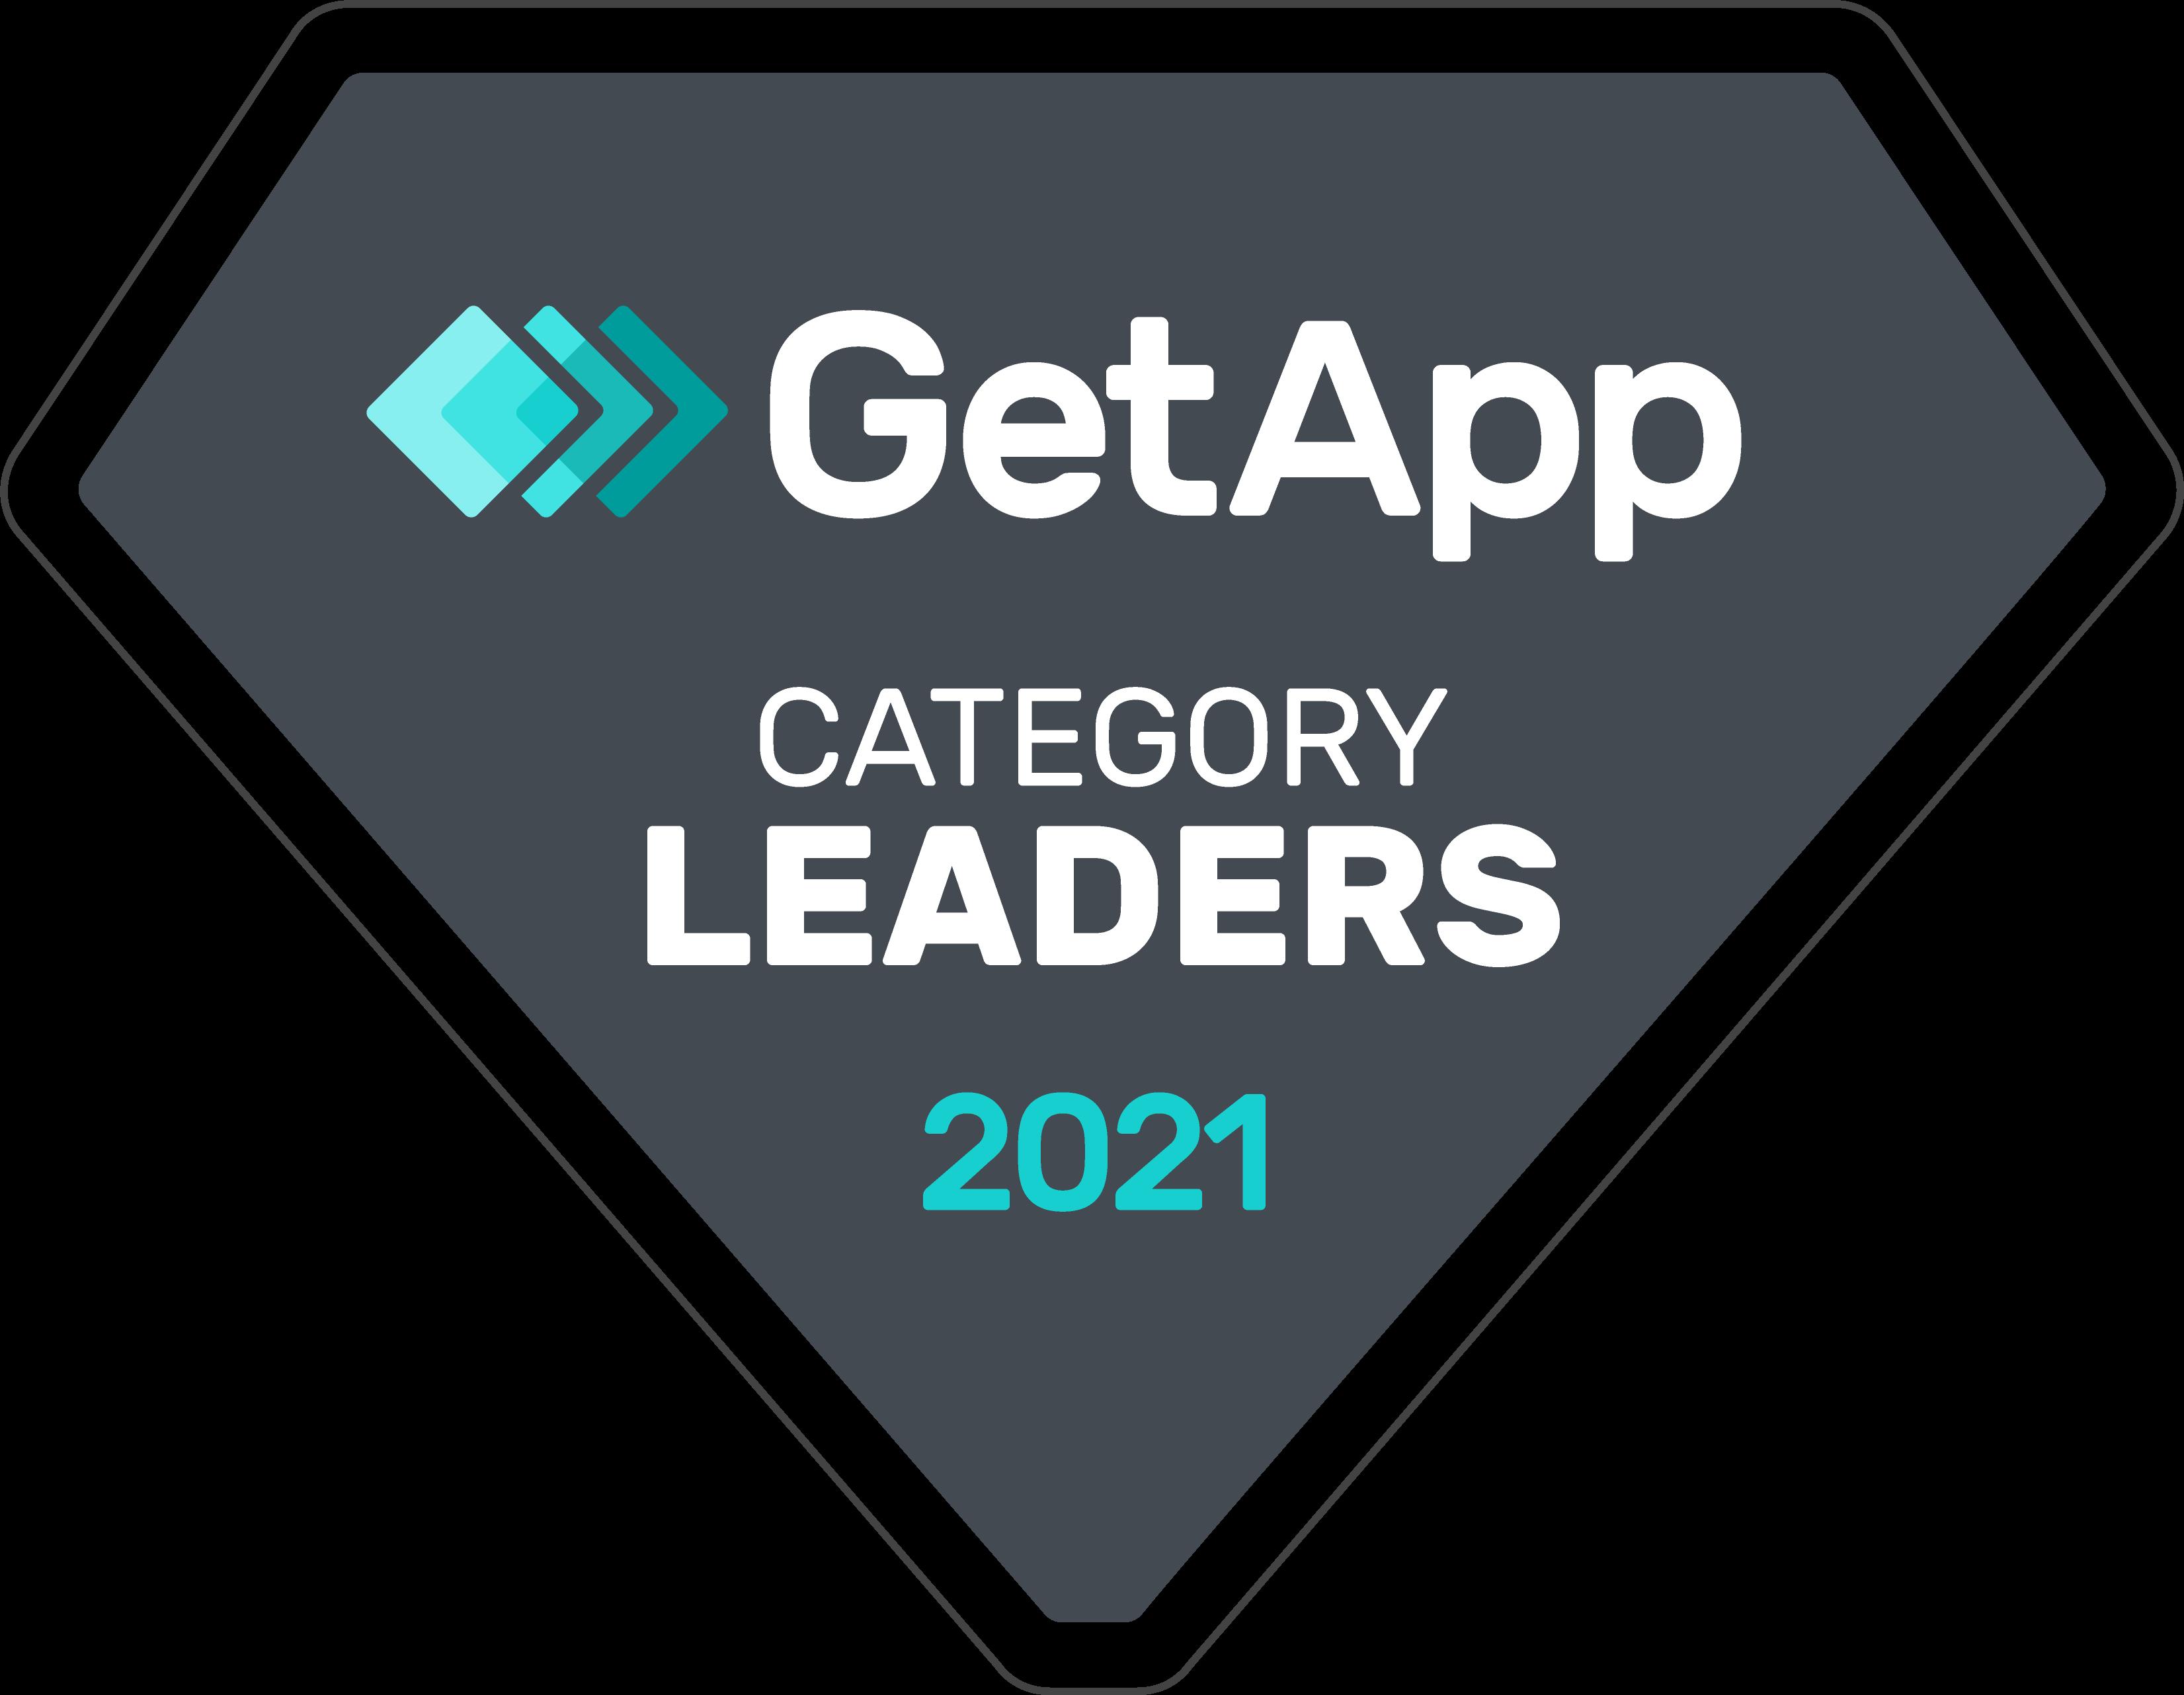 GetApp Category Leader badge for 2021